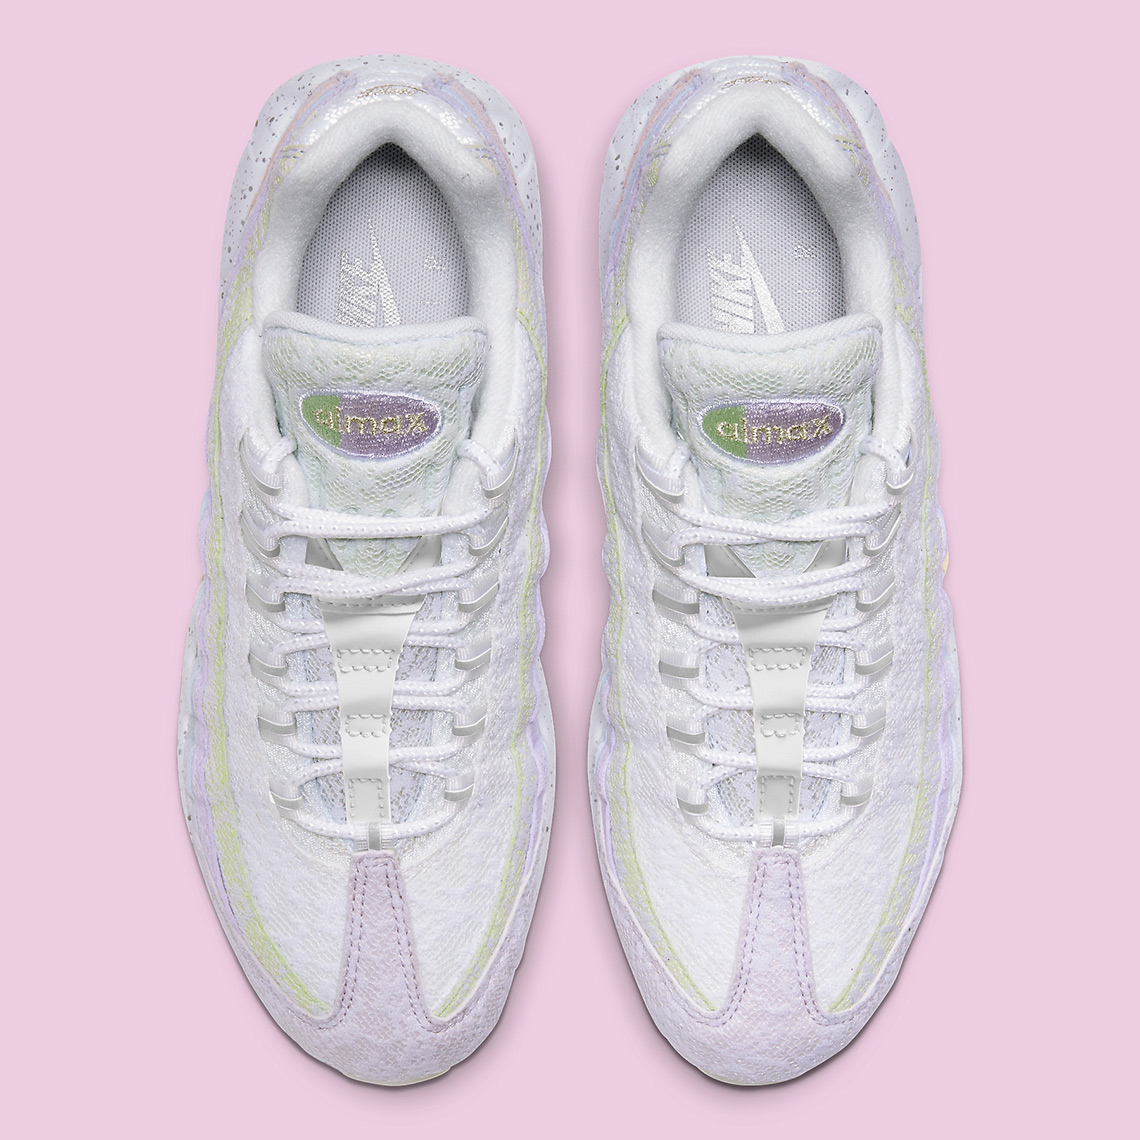 air max 95 laces